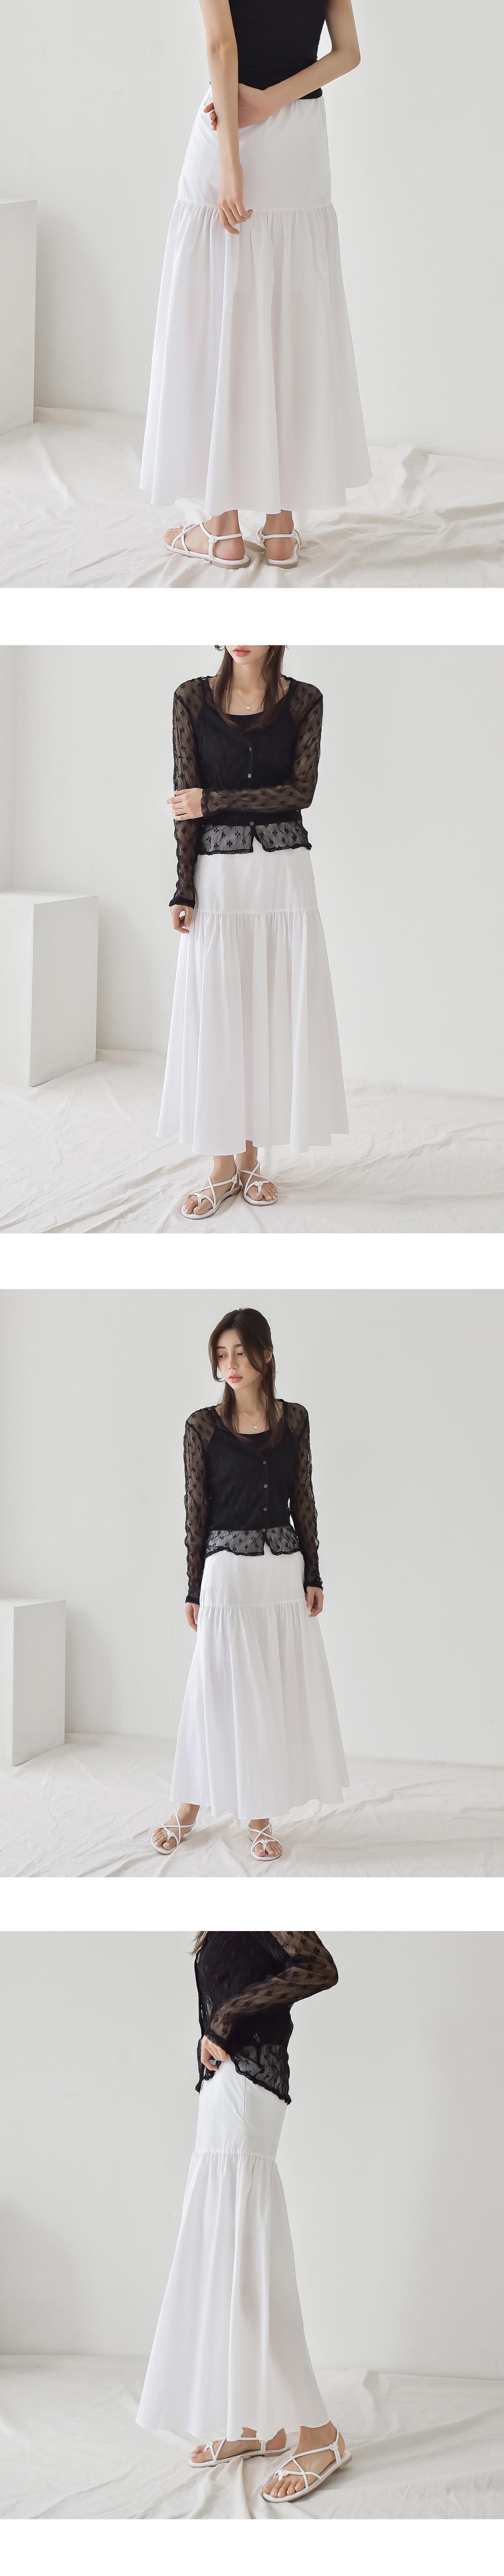 Rani shirring skirt